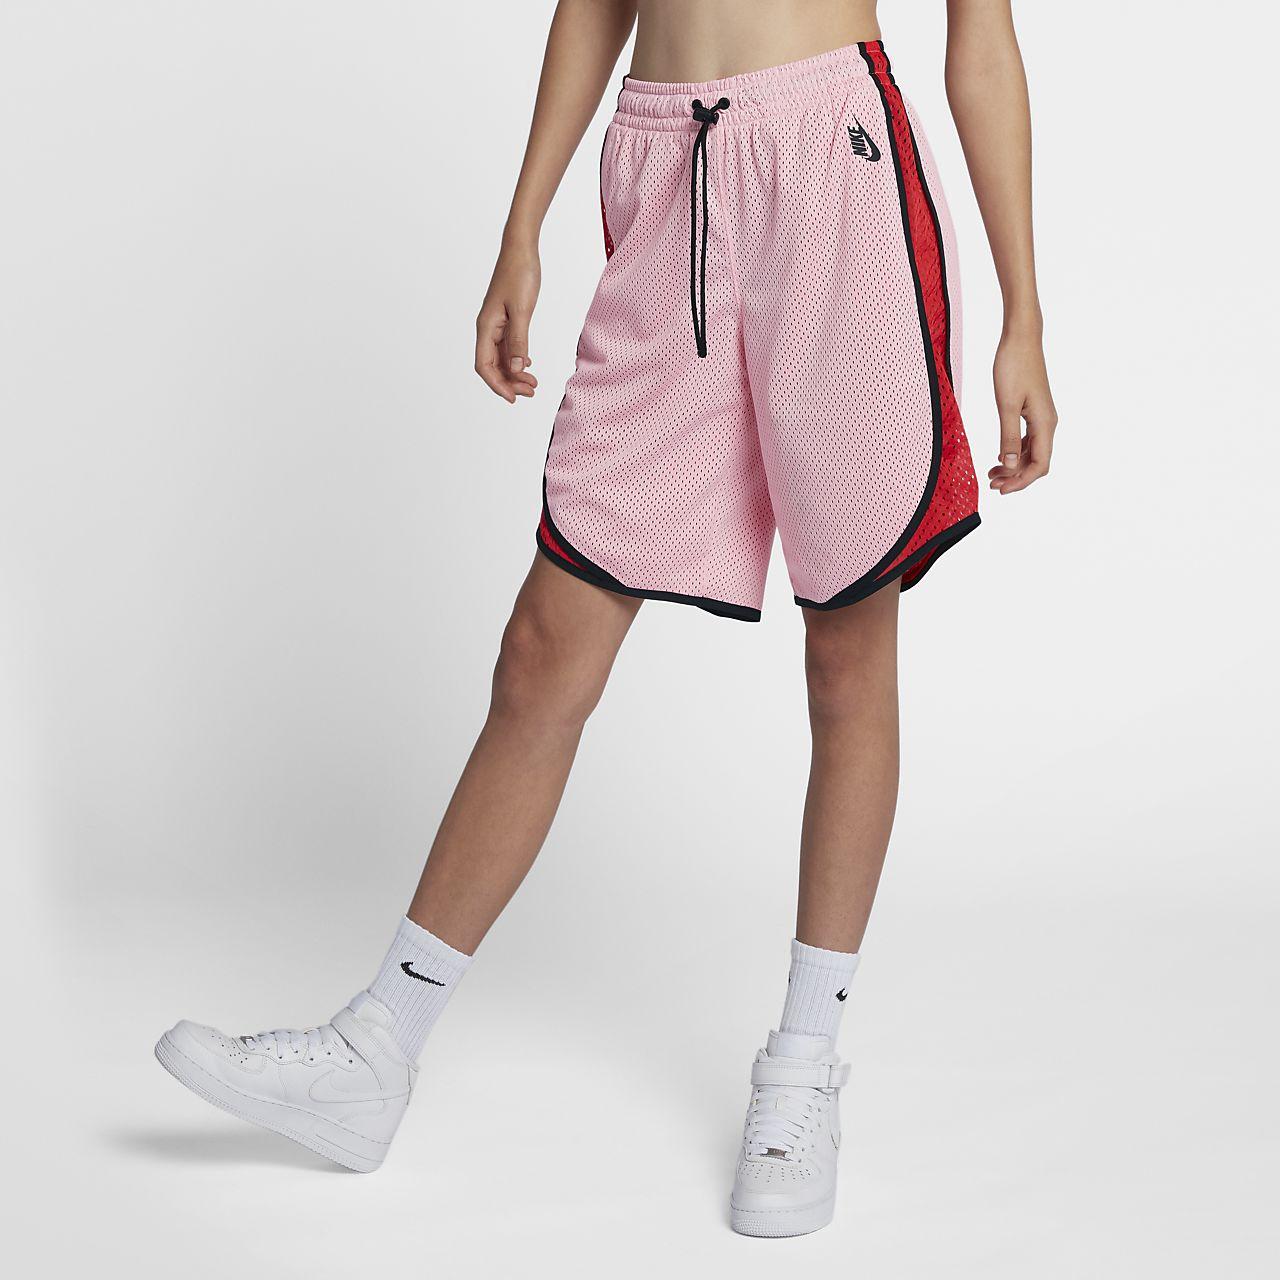 NikeLab Collection Women's Shorts